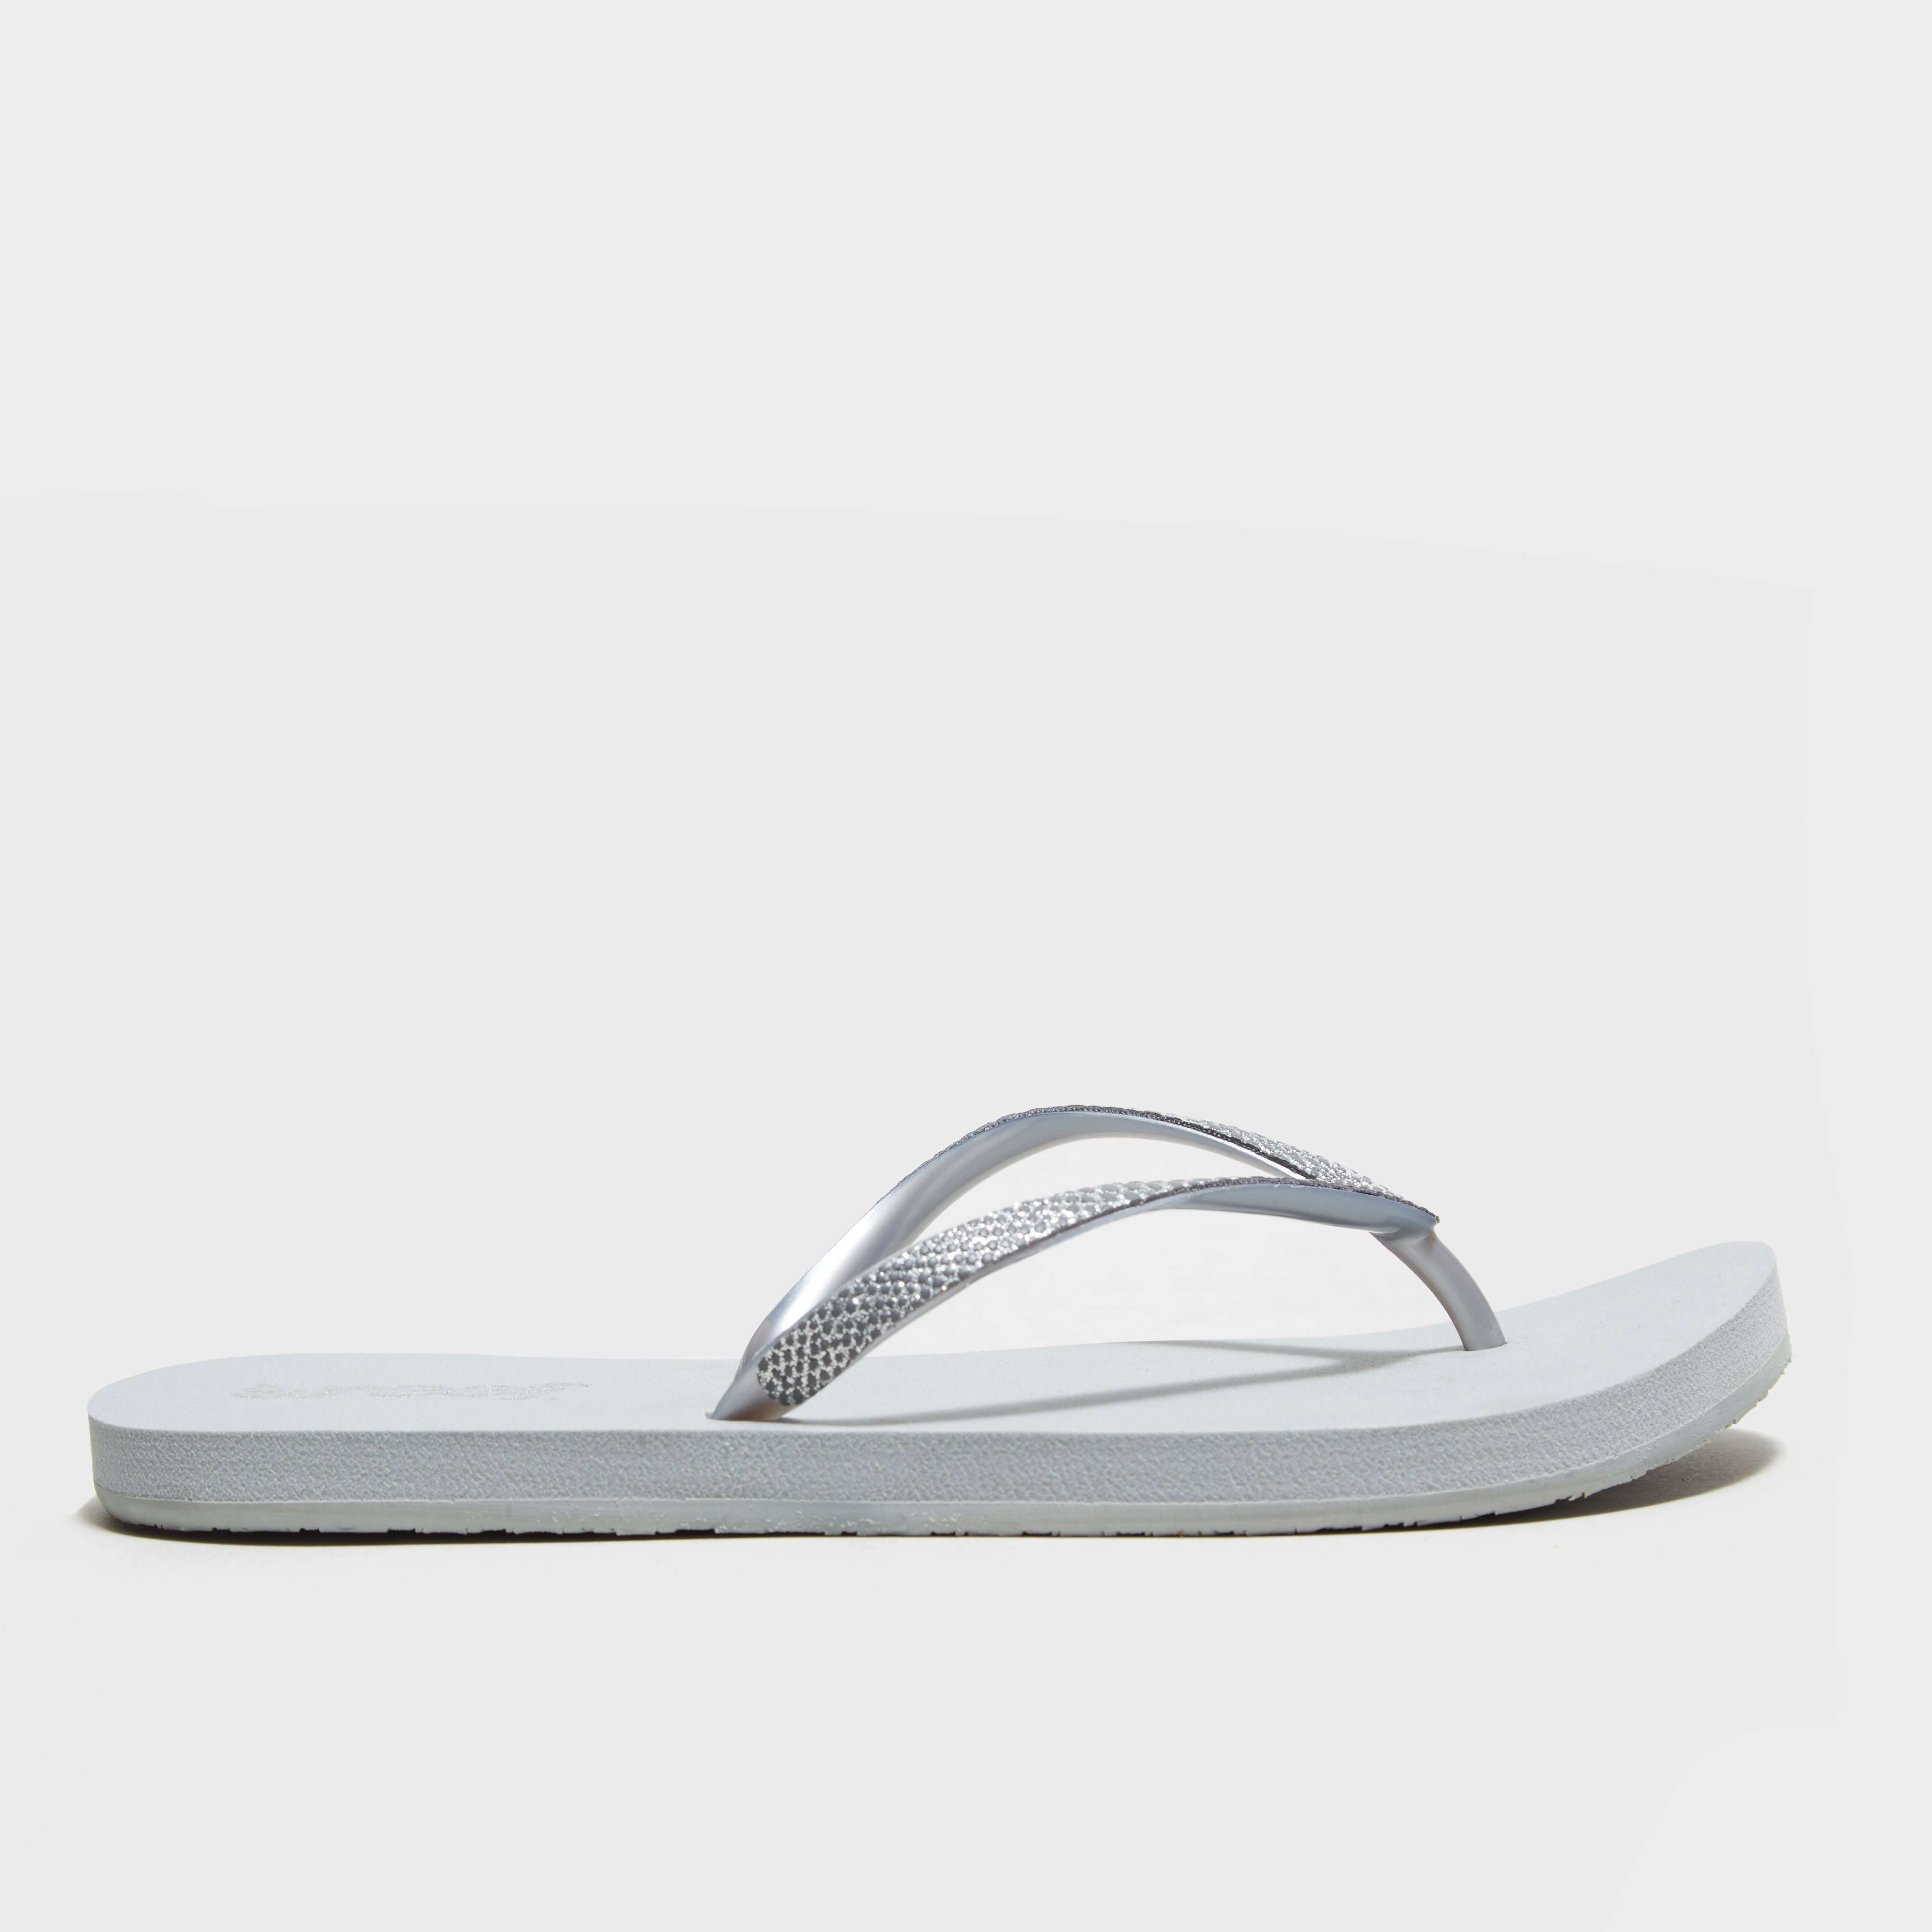 REEF Women's Stargazer Sassy Flip Flops